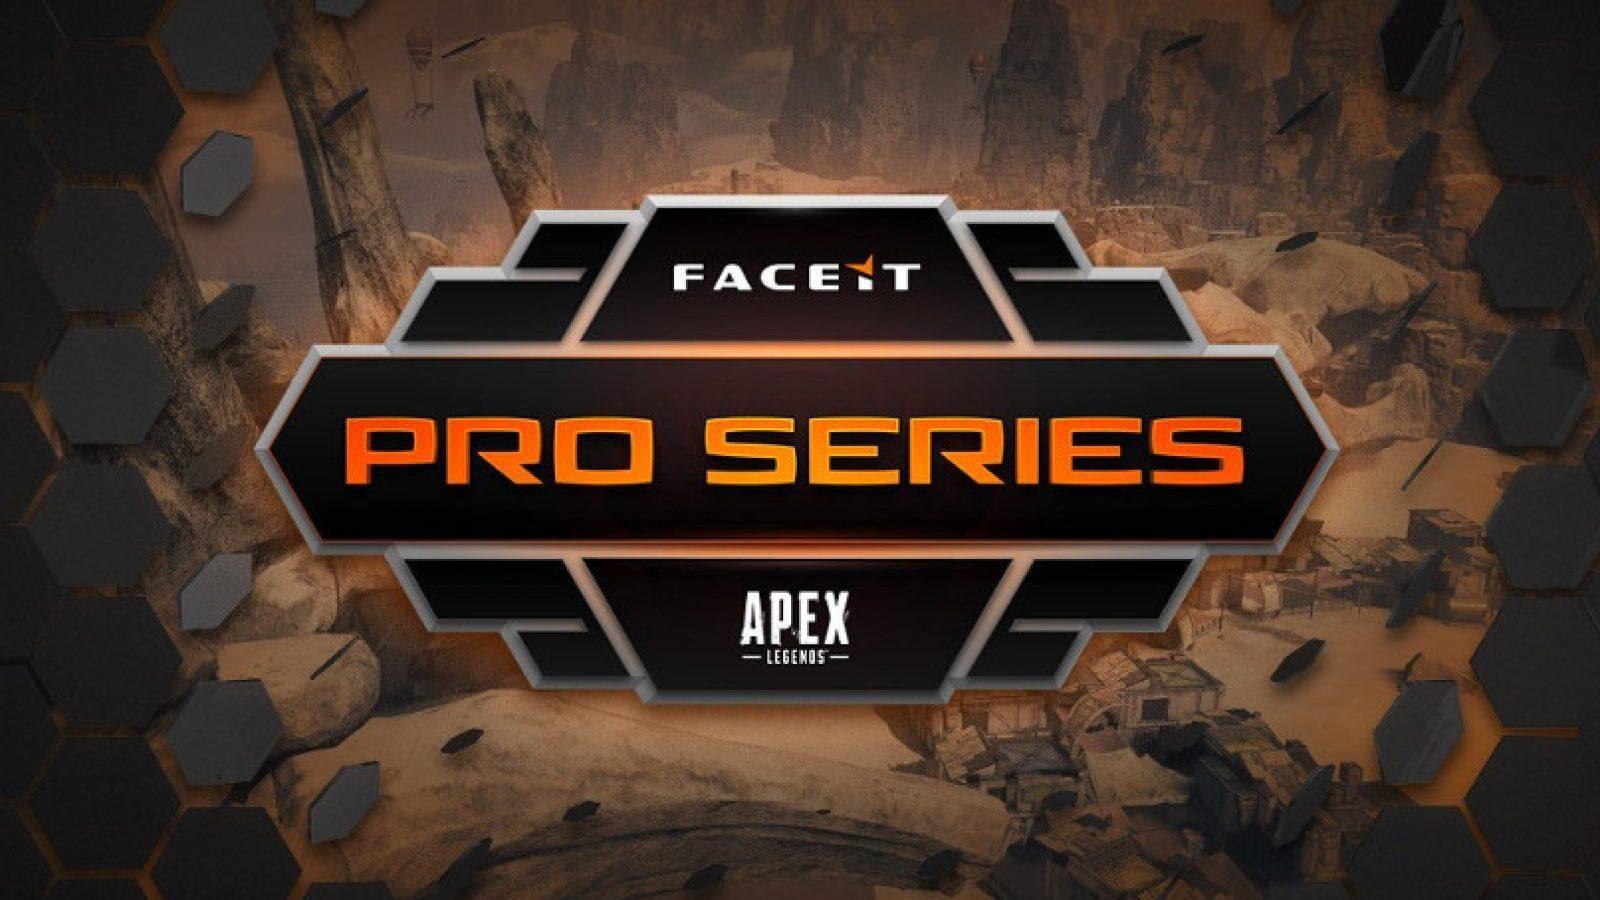 Faceit organiza la pro series de Apex Legends